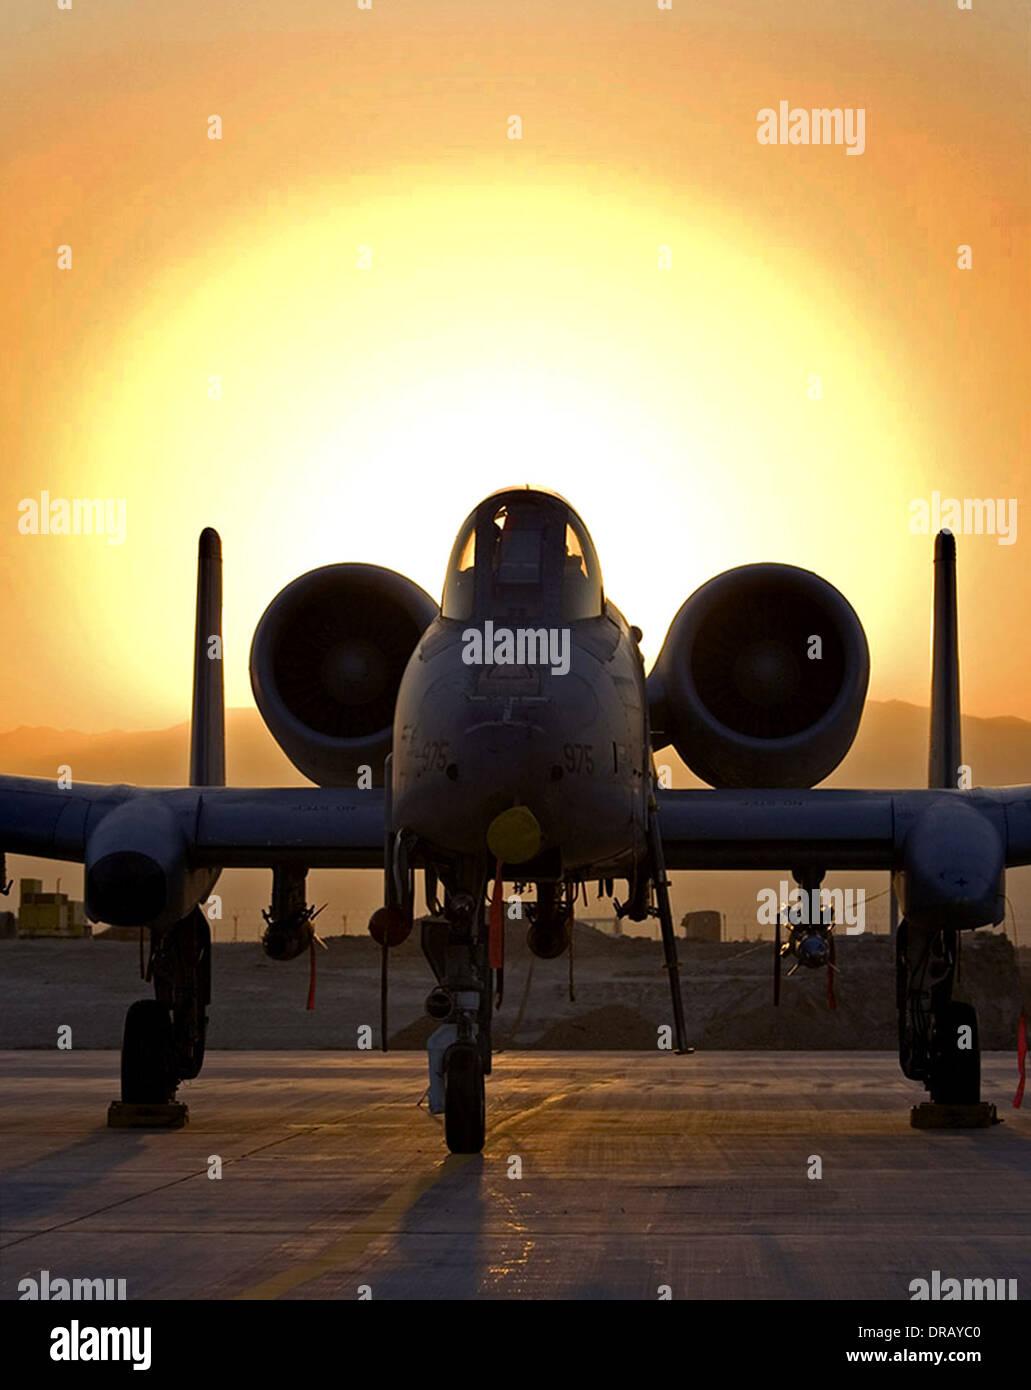 A-10 Thunderbolt II at dawn at Bagram Air Base, Afghanistan - Stock Image